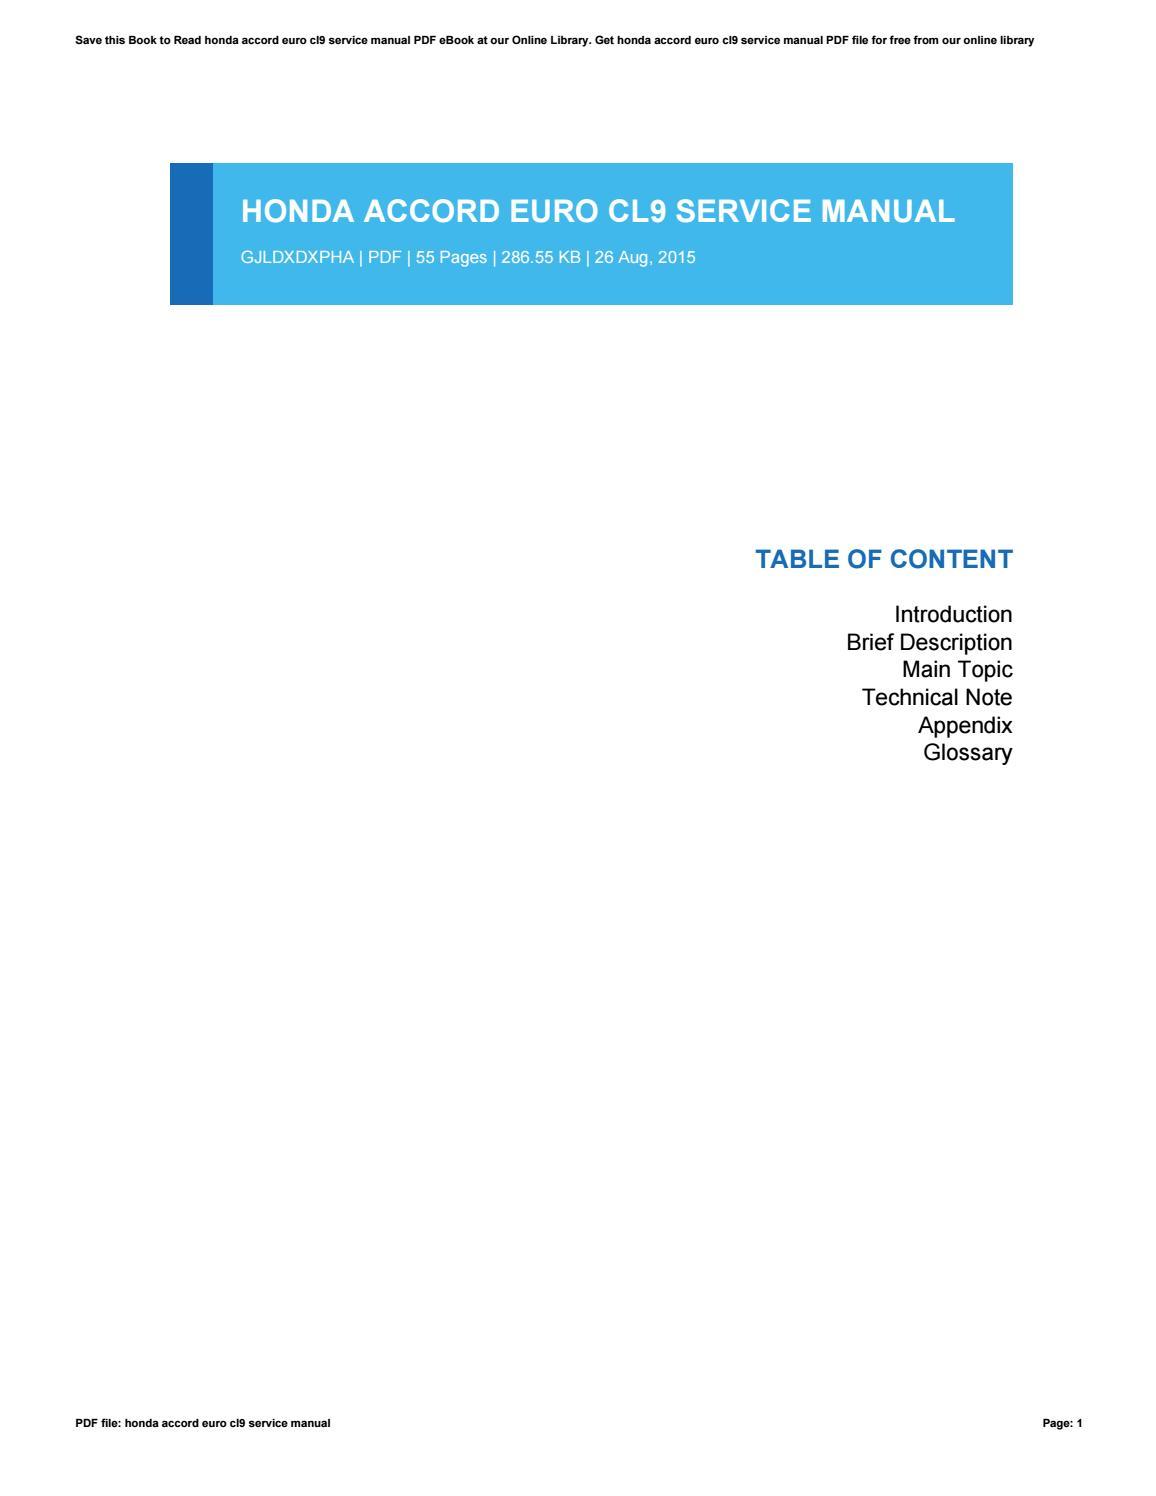 1990 honda civic service manual fre